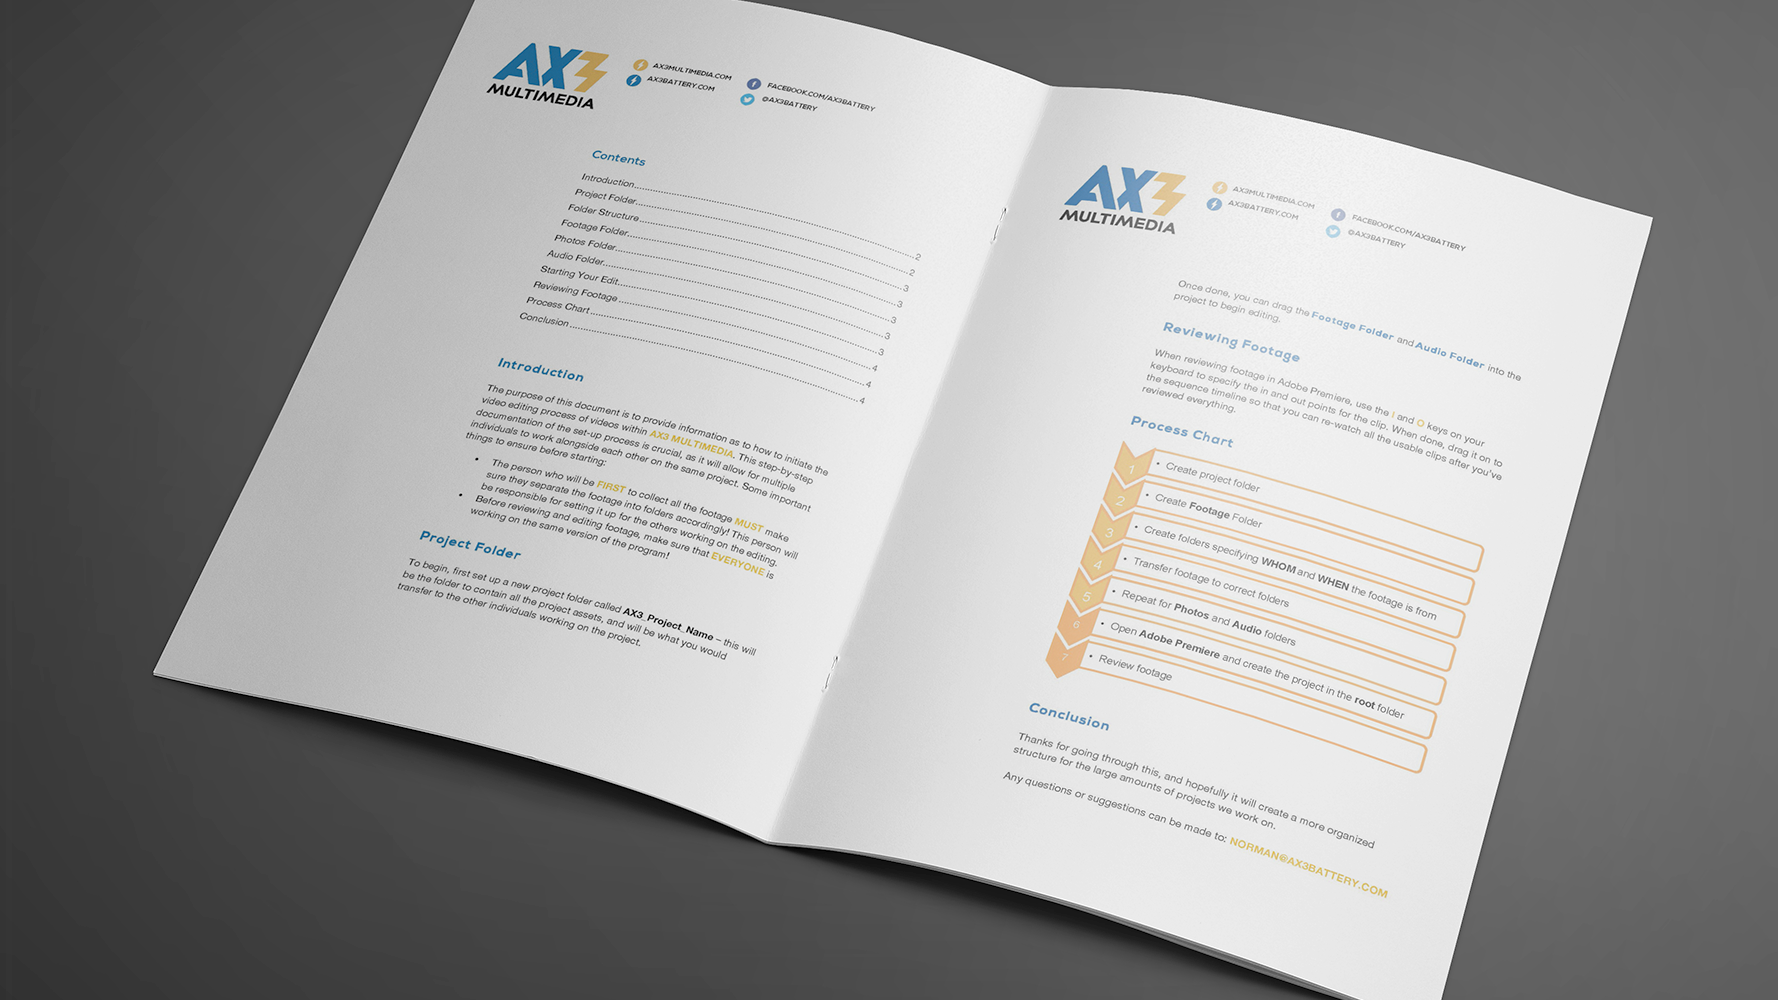 AX3-FileStructure-2